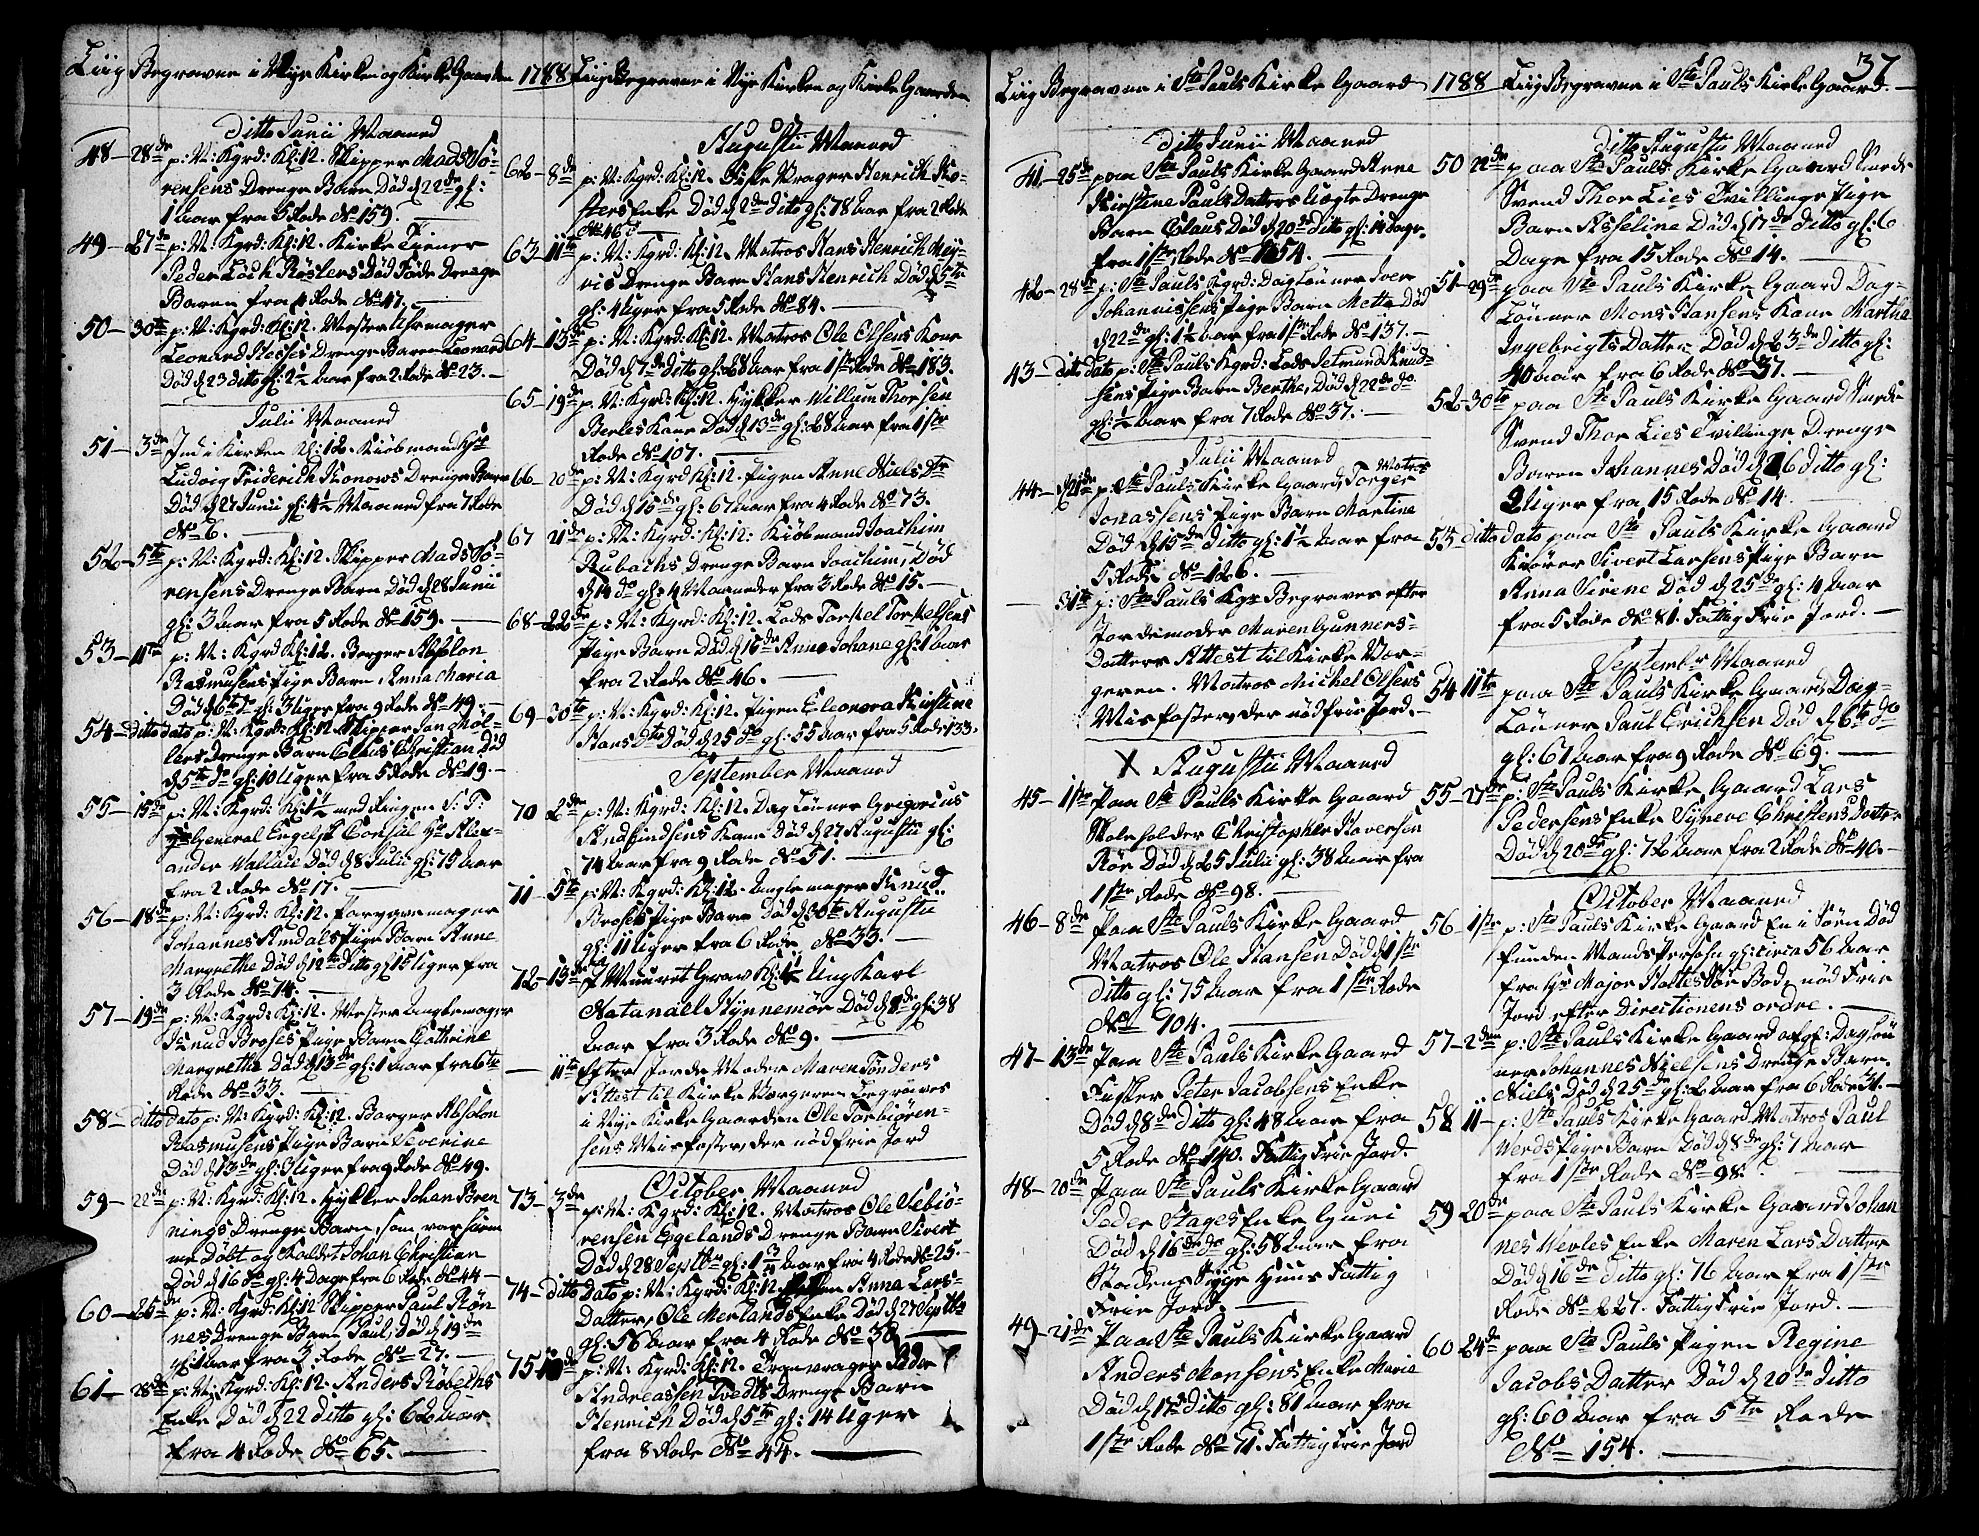 SAB, Nykirken Sokneprestembete, H/Hab: Klokkerbok nr. A 3, 1775-1820, s. 37